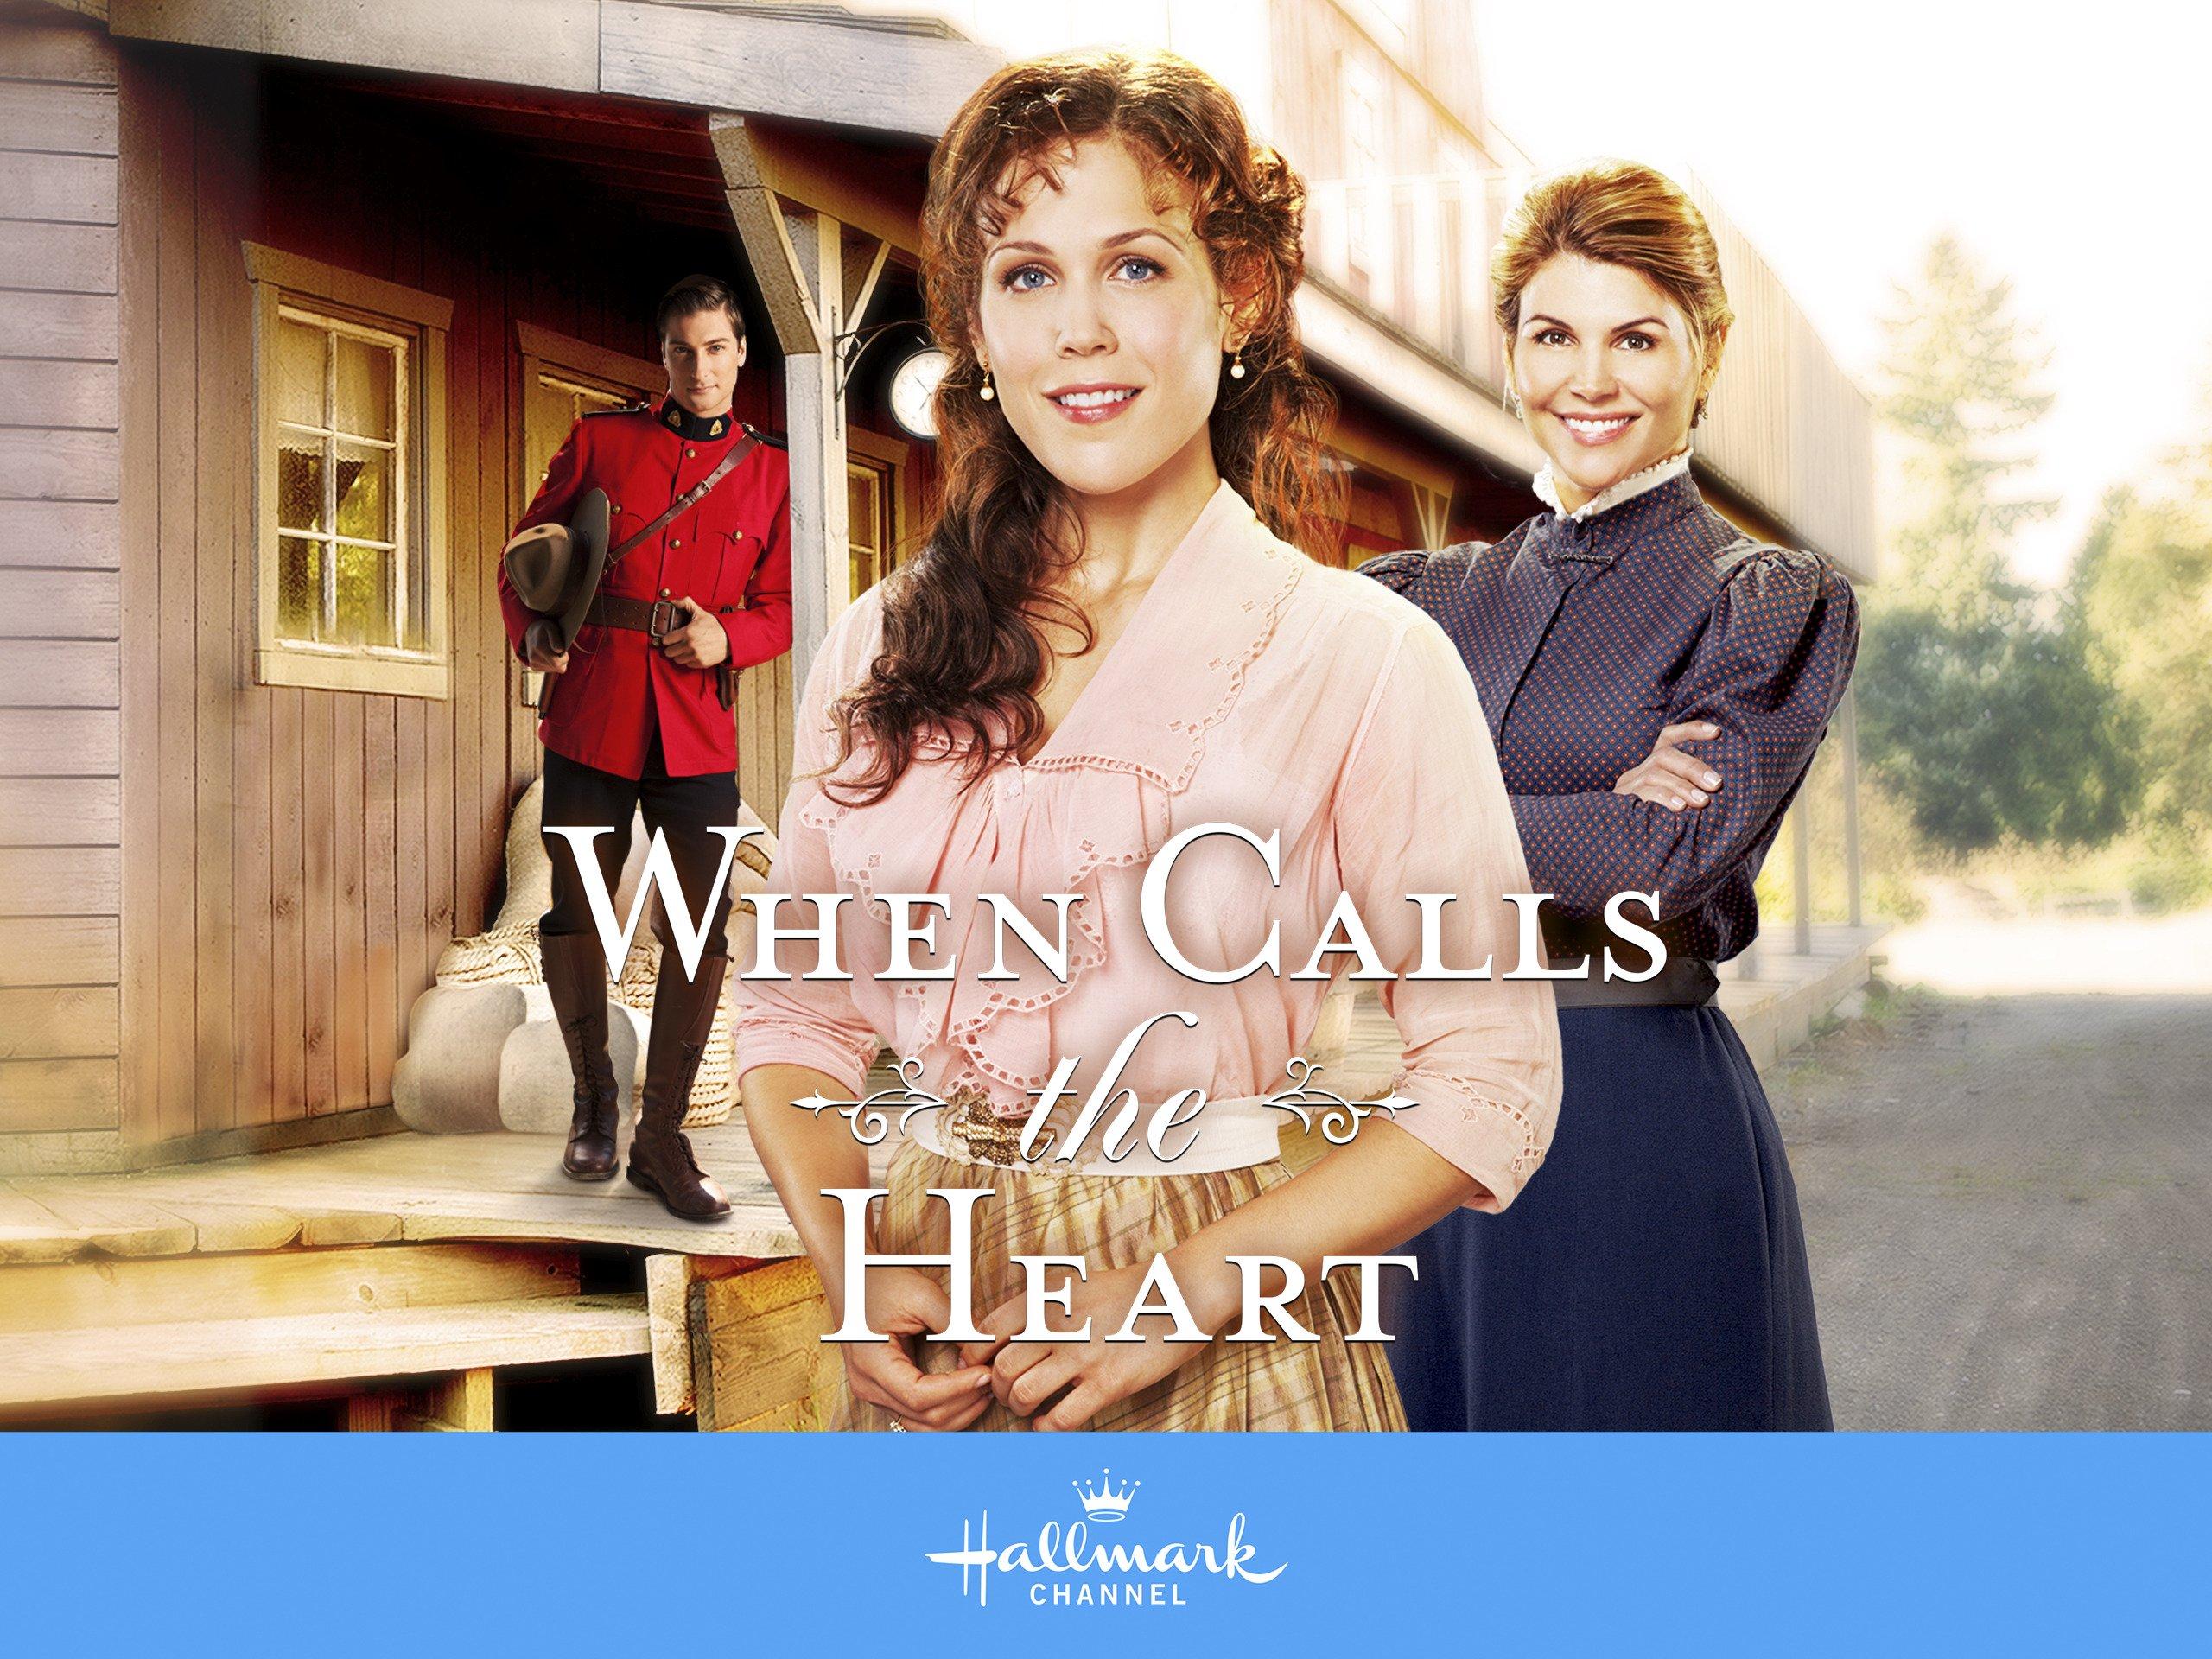 Amazon.com: When Calls The Heart Season 1: Erin Krakow, Lori Loughlin,  Martin Cummins, Neil Fearnley, Jon Nappa, Michael Landon Jr, Brian Bird,  Brad Krevoy, ...